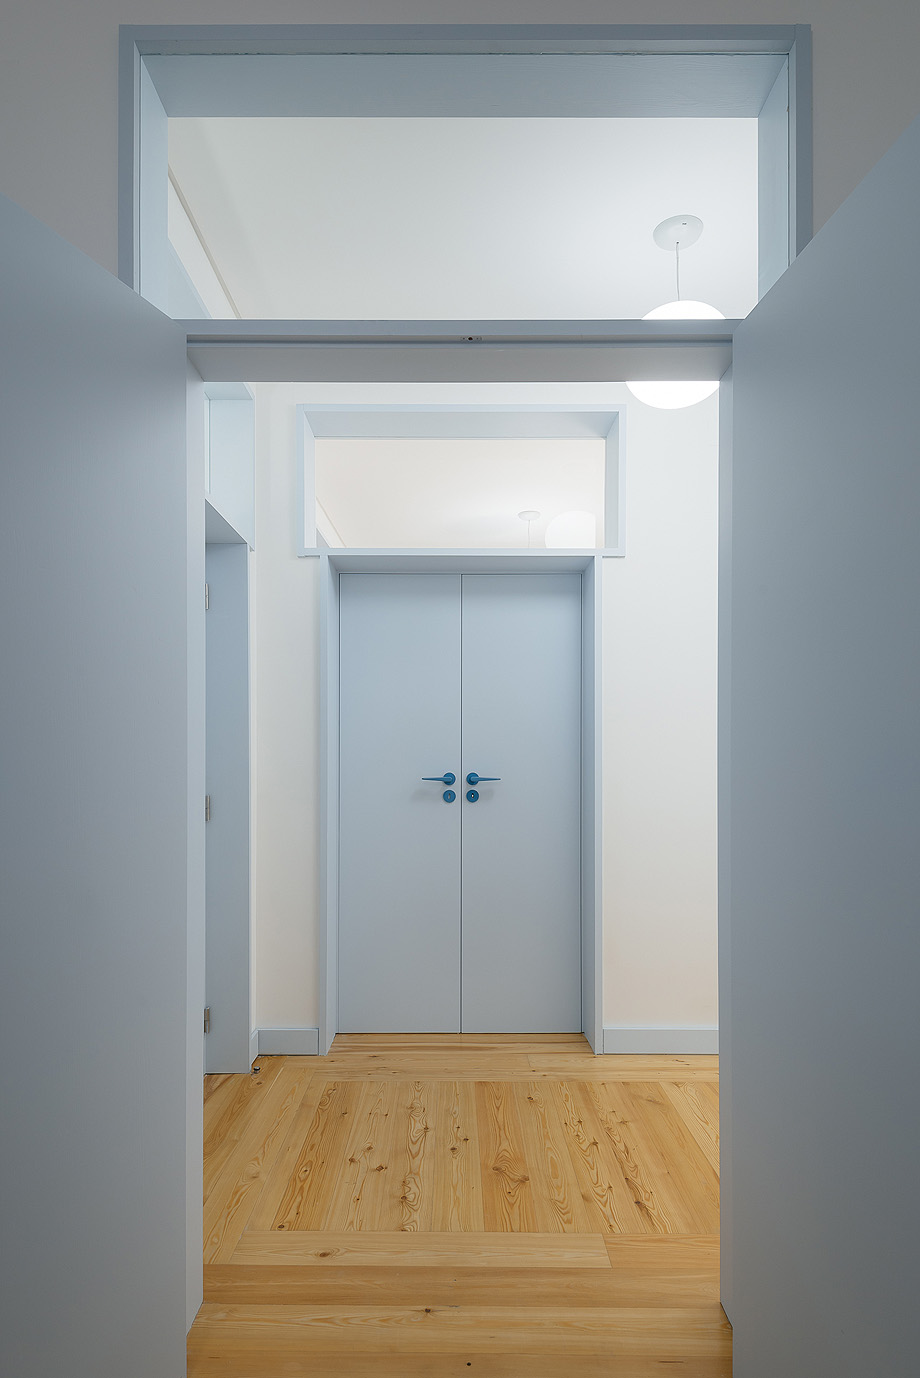 apartamentos pombalinos de aurora arquitectos - foto do mal o menos (12)